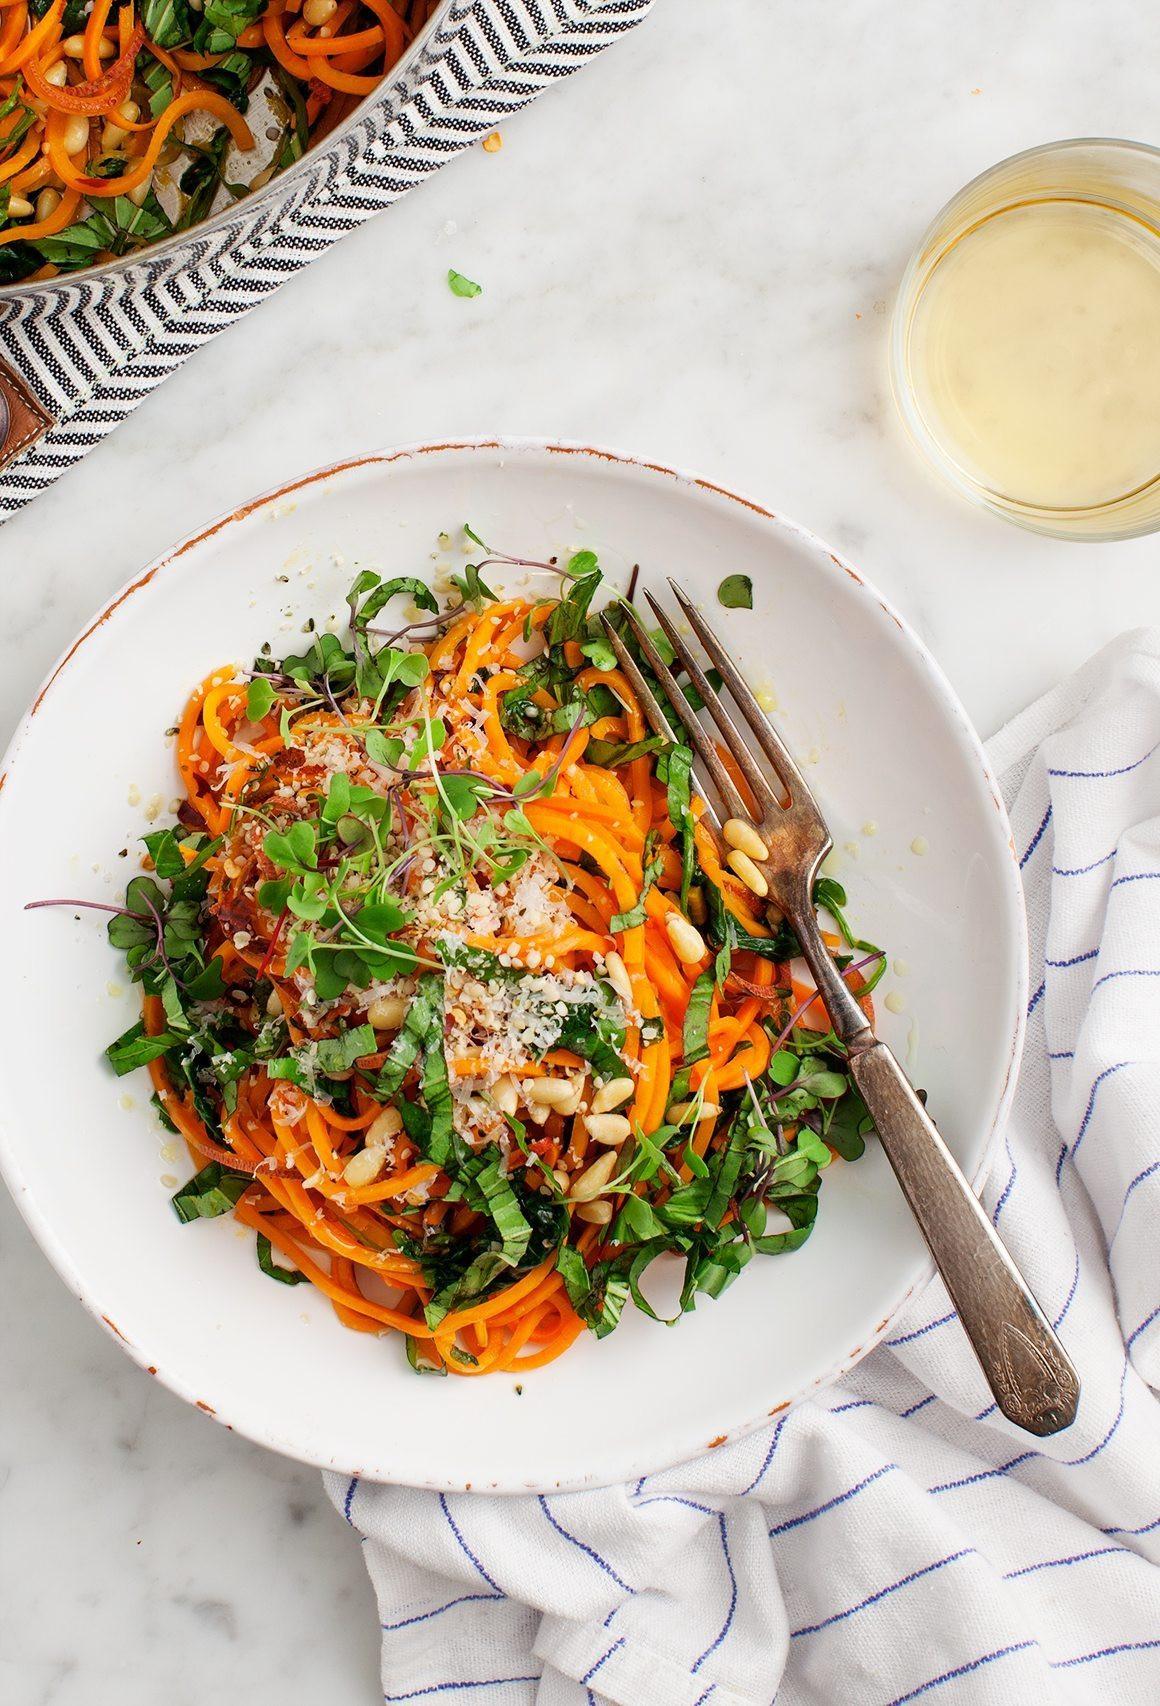 Healthy Vegetarian Dinner  Healthy Ve arian Dinner Recipes Love and Lemons